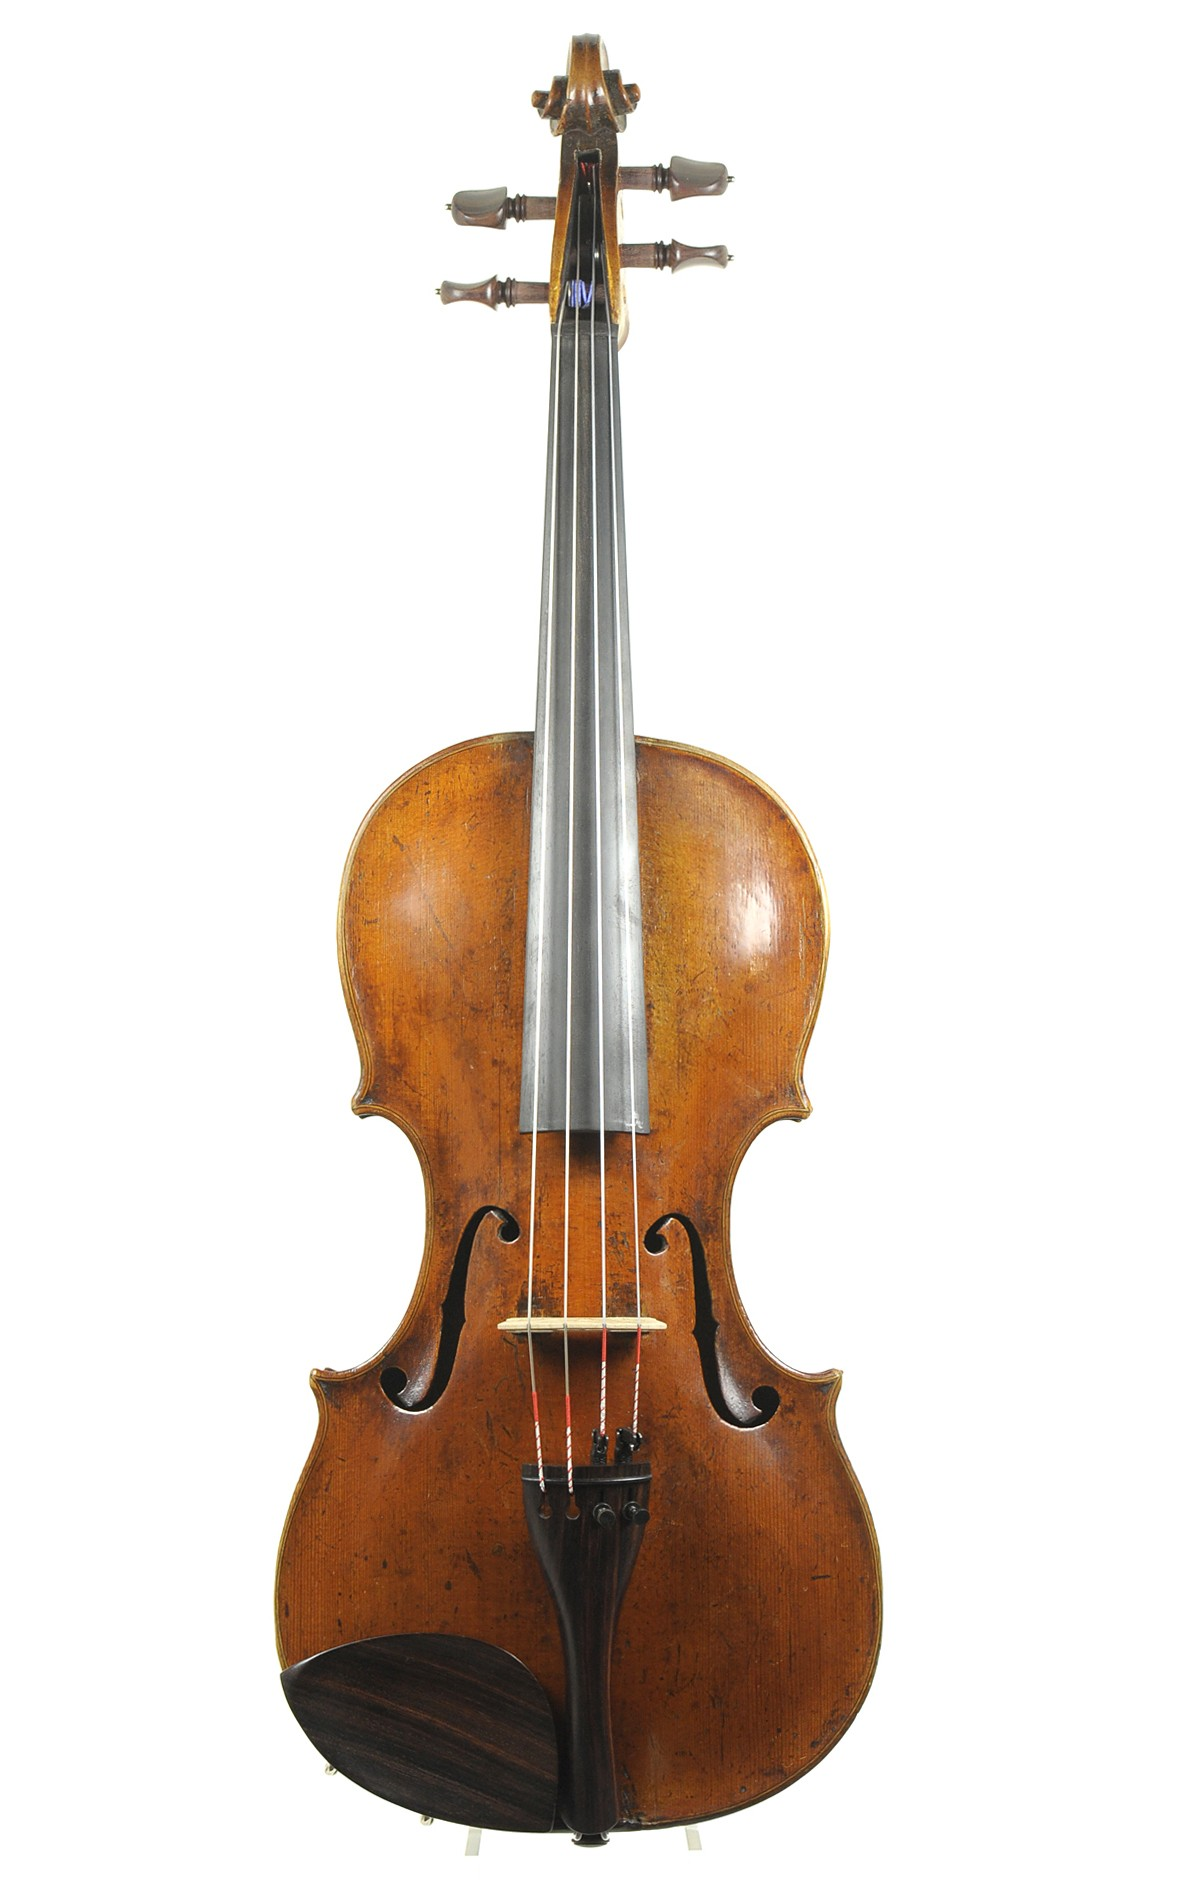 Fine Markneukirchen viola, Johann Christian Voigt II, 18th century - table